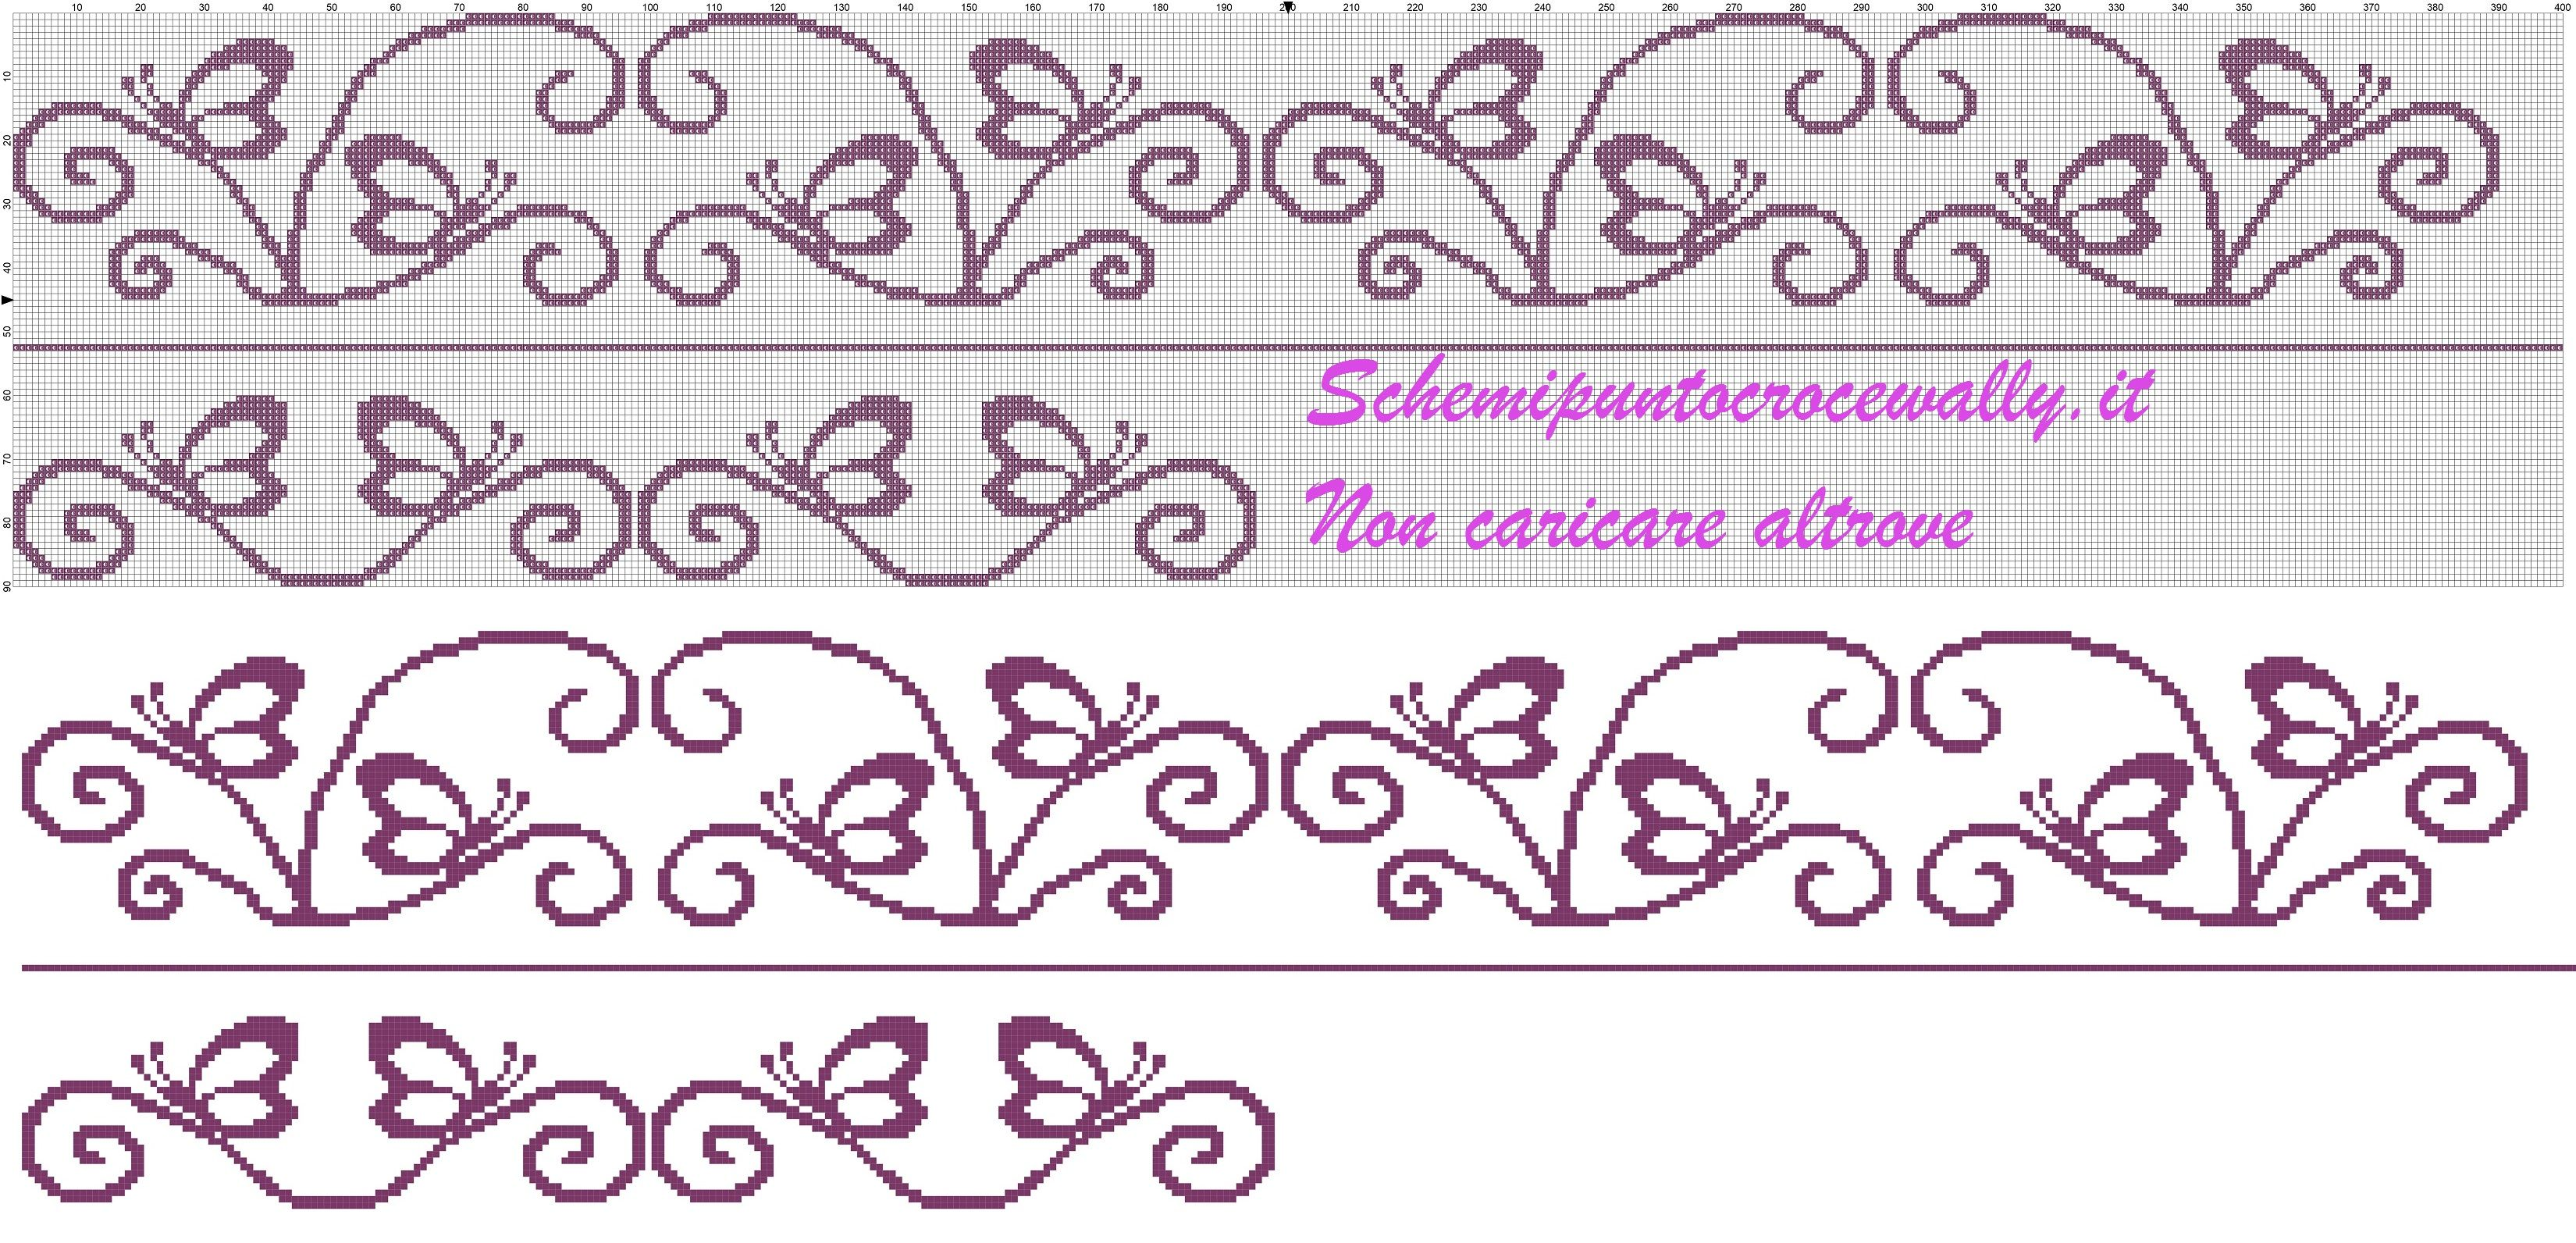 Schema punto croce gratis per asciugamani farfalle for Farfalle punto croce schemi gratis